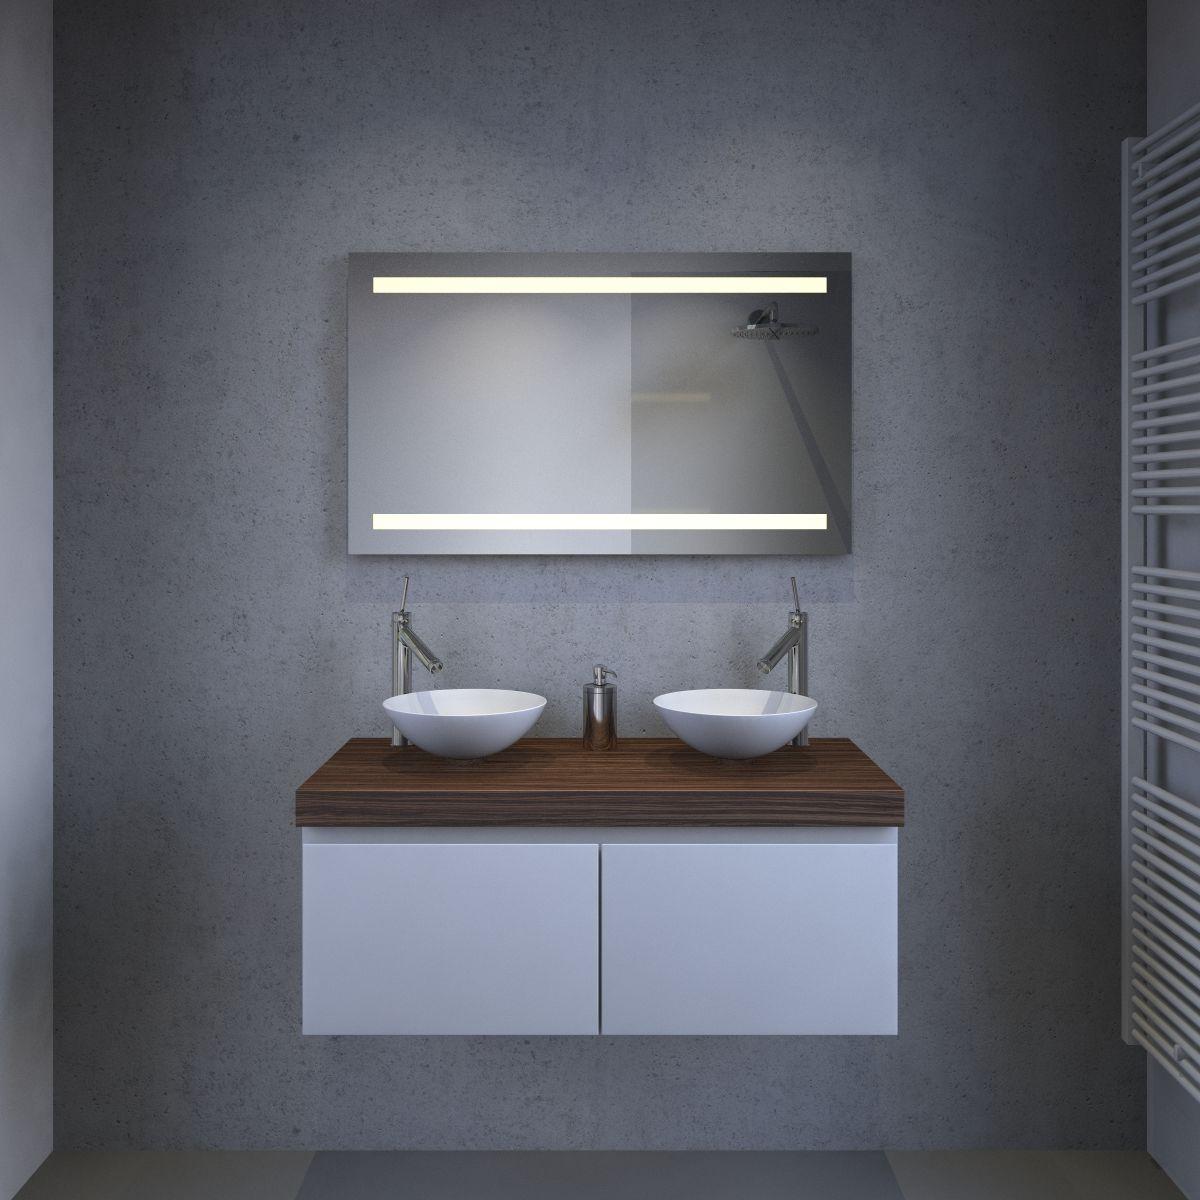 Badkamerspiegel met led verlichting spiegelverwarming en Badkamerspiegel met led verlichting en verwarming